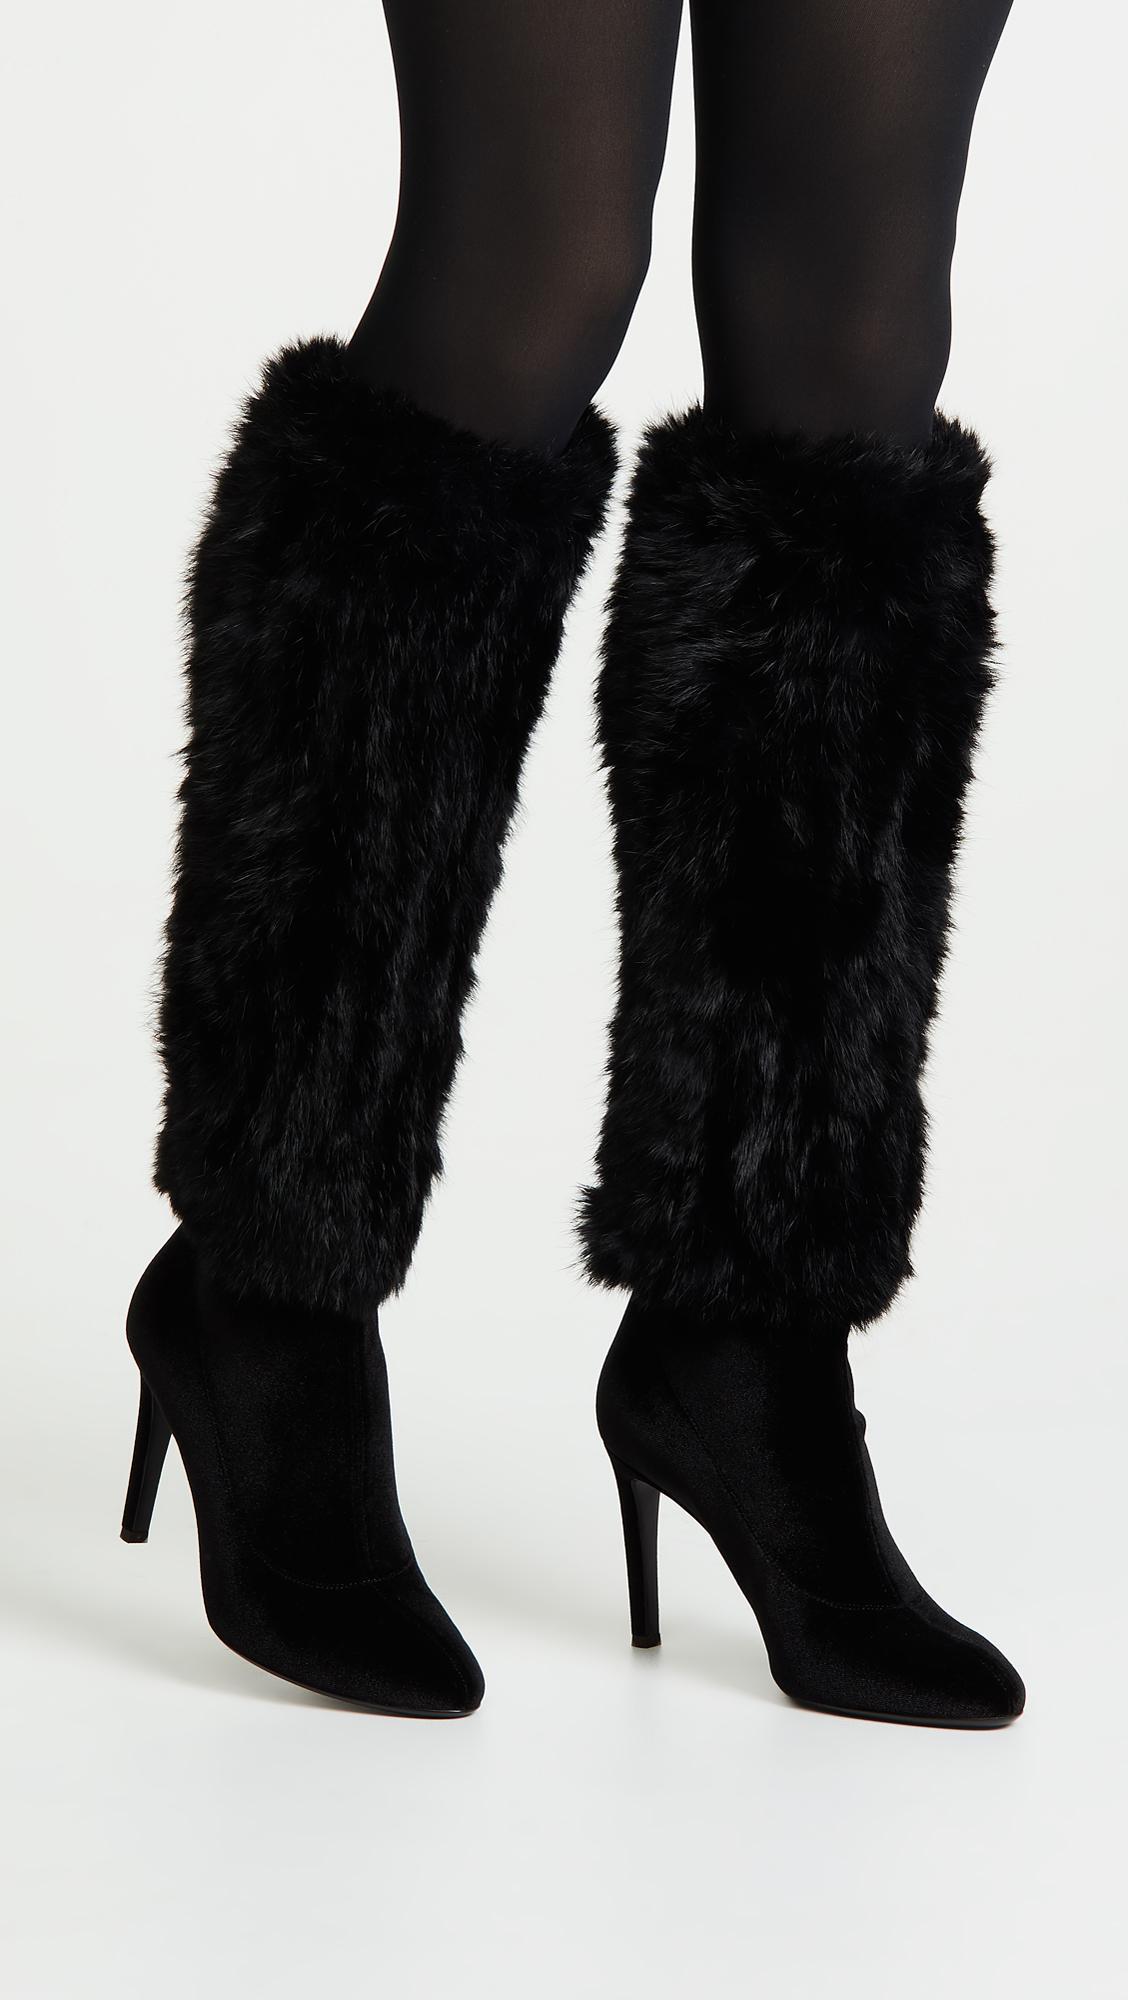 2a5a46661afc63 Giuseppe Zanotti - Black Velvet Knee Boots With Fur Trim - Lyst. View  fullscreen